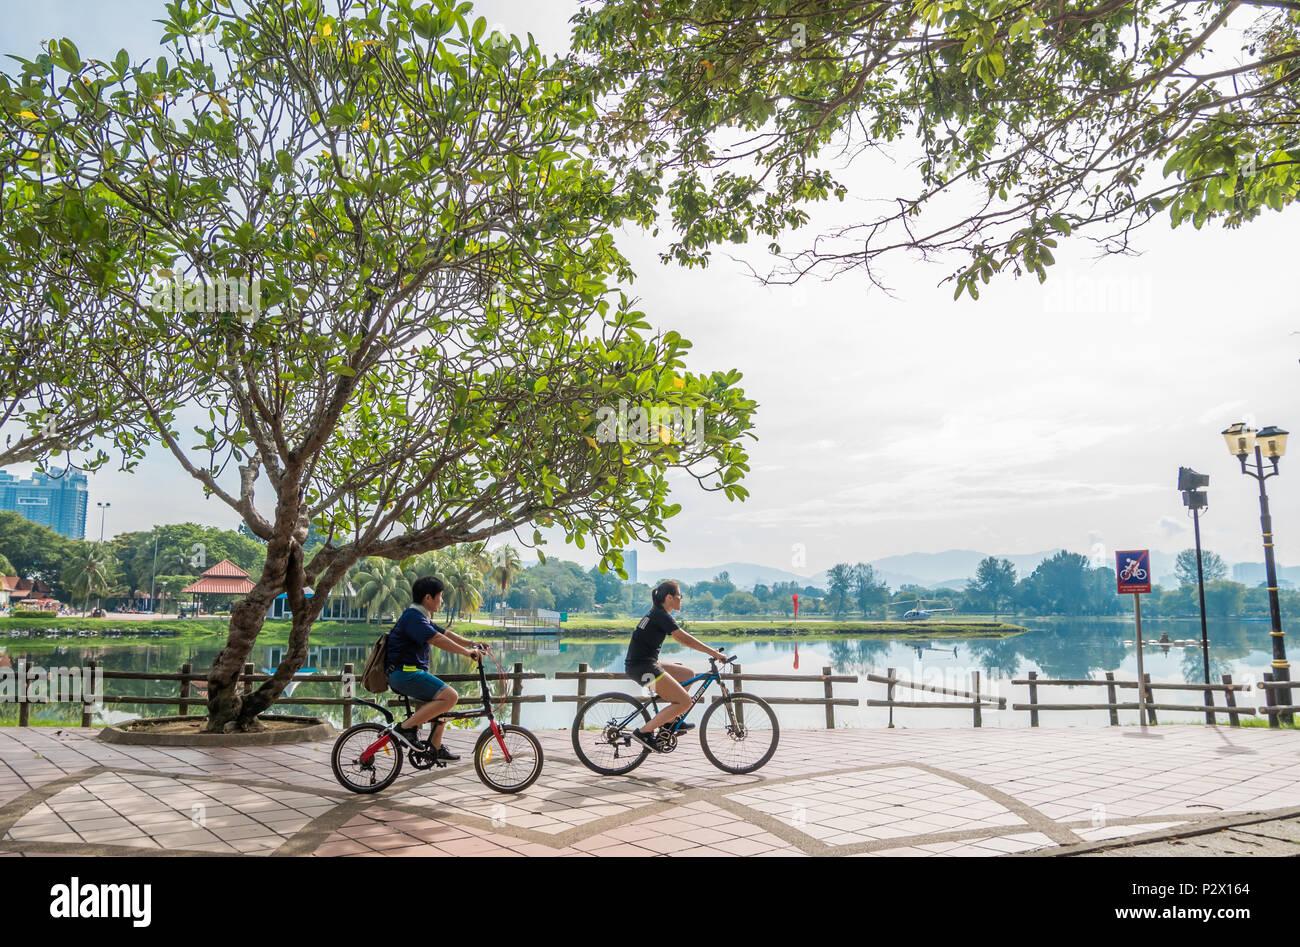 Kuala Lumpur, Malaysia - May 29,2018 : People can seen cycling bicycles to explore the beautiful of the Titiwangsa Lake Gardens in the morning. - Stock Image